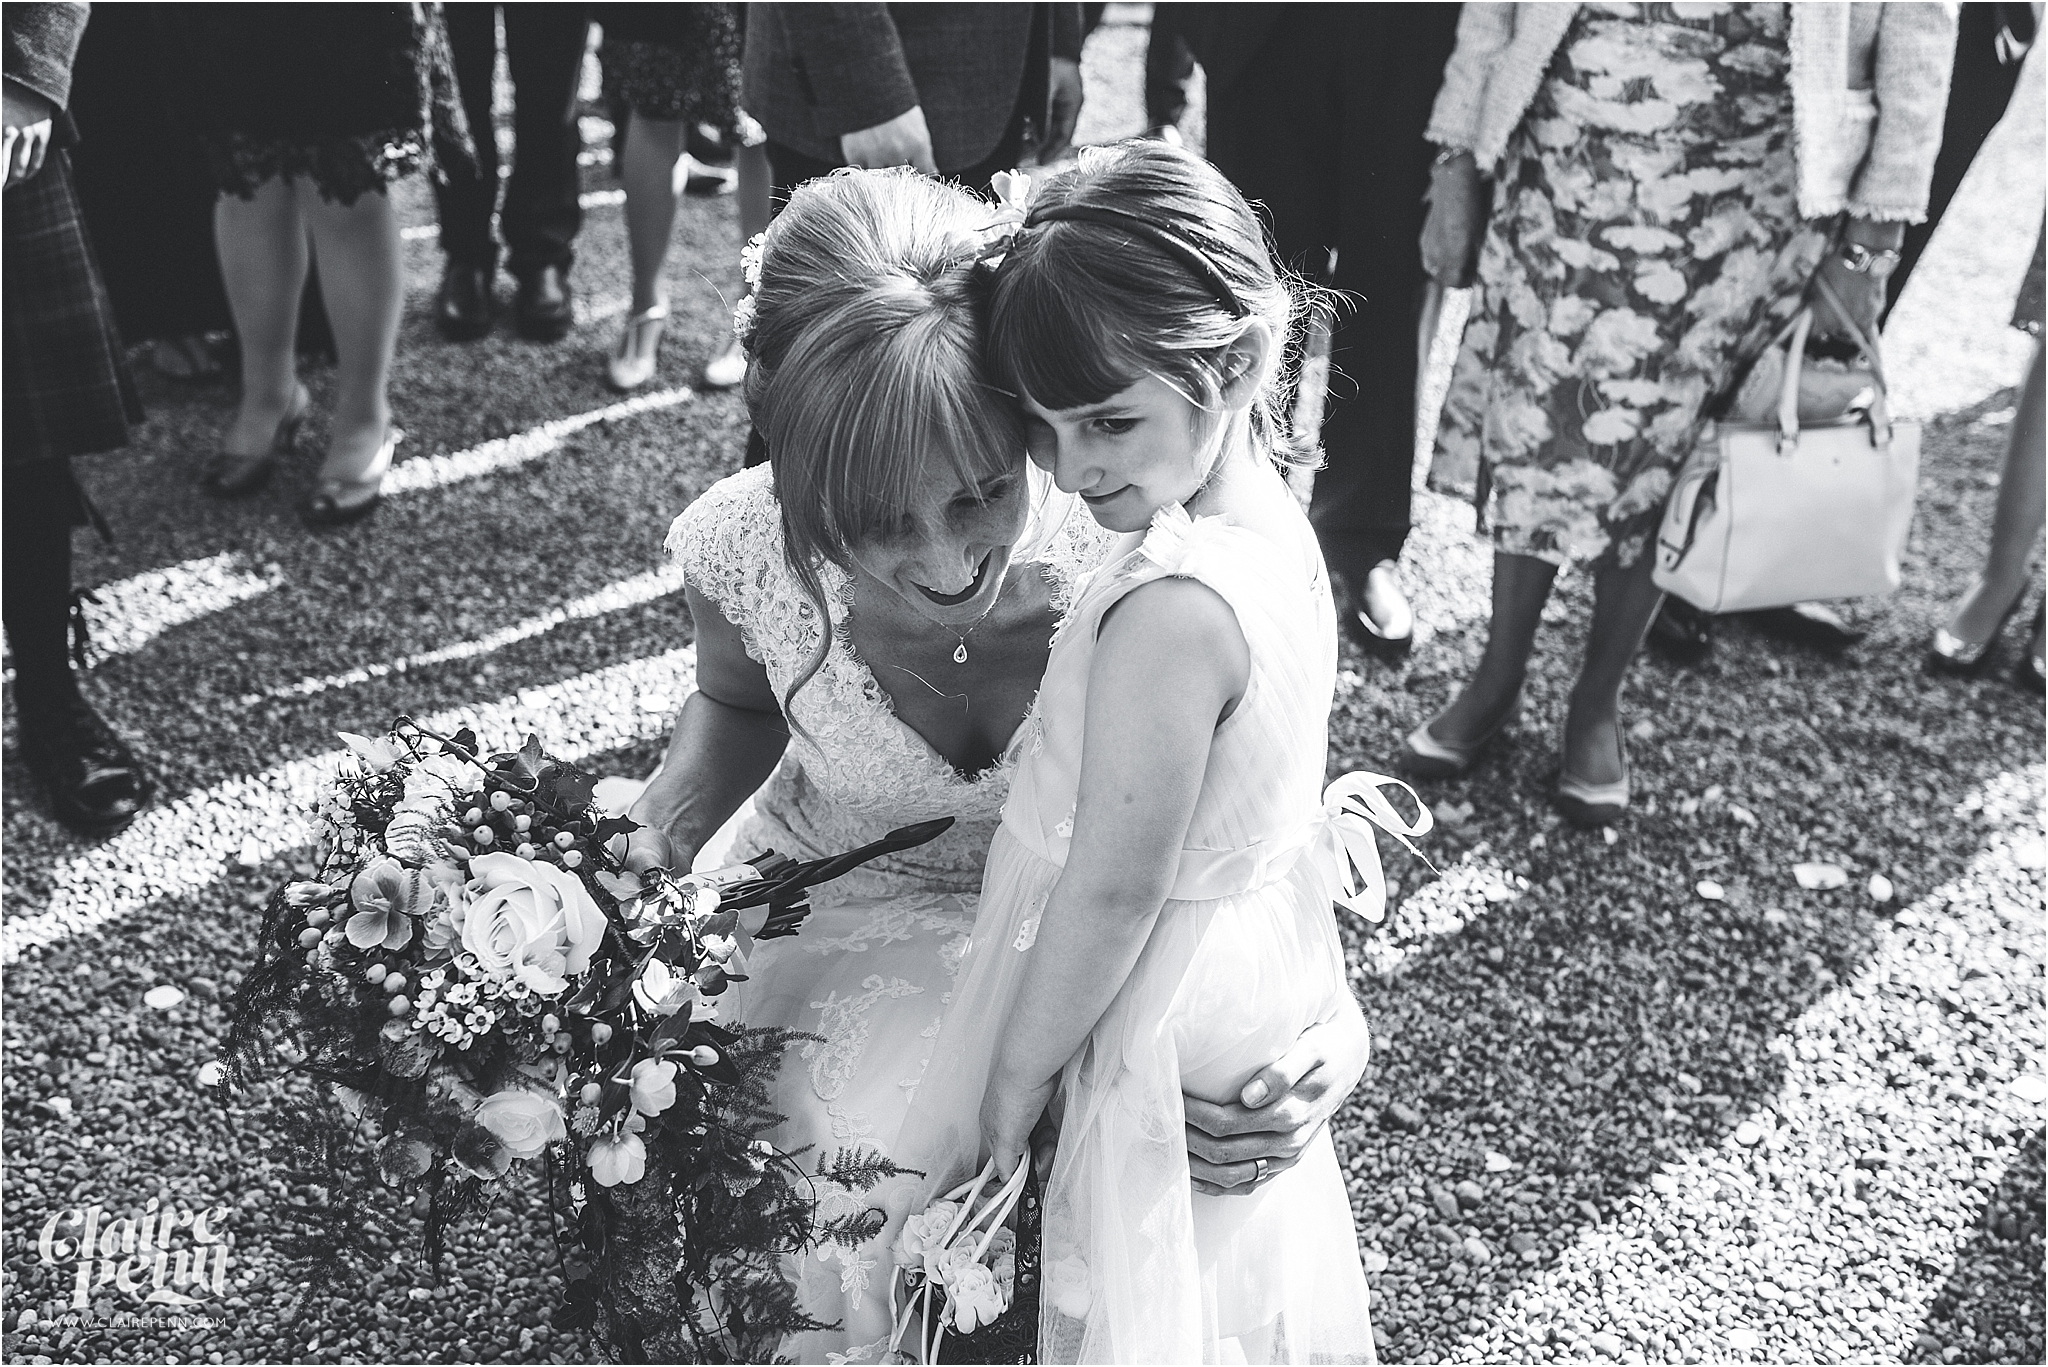 Iscoyd Park wedding, Whitchurch, Cheshire wedding photographer_0026.jpg